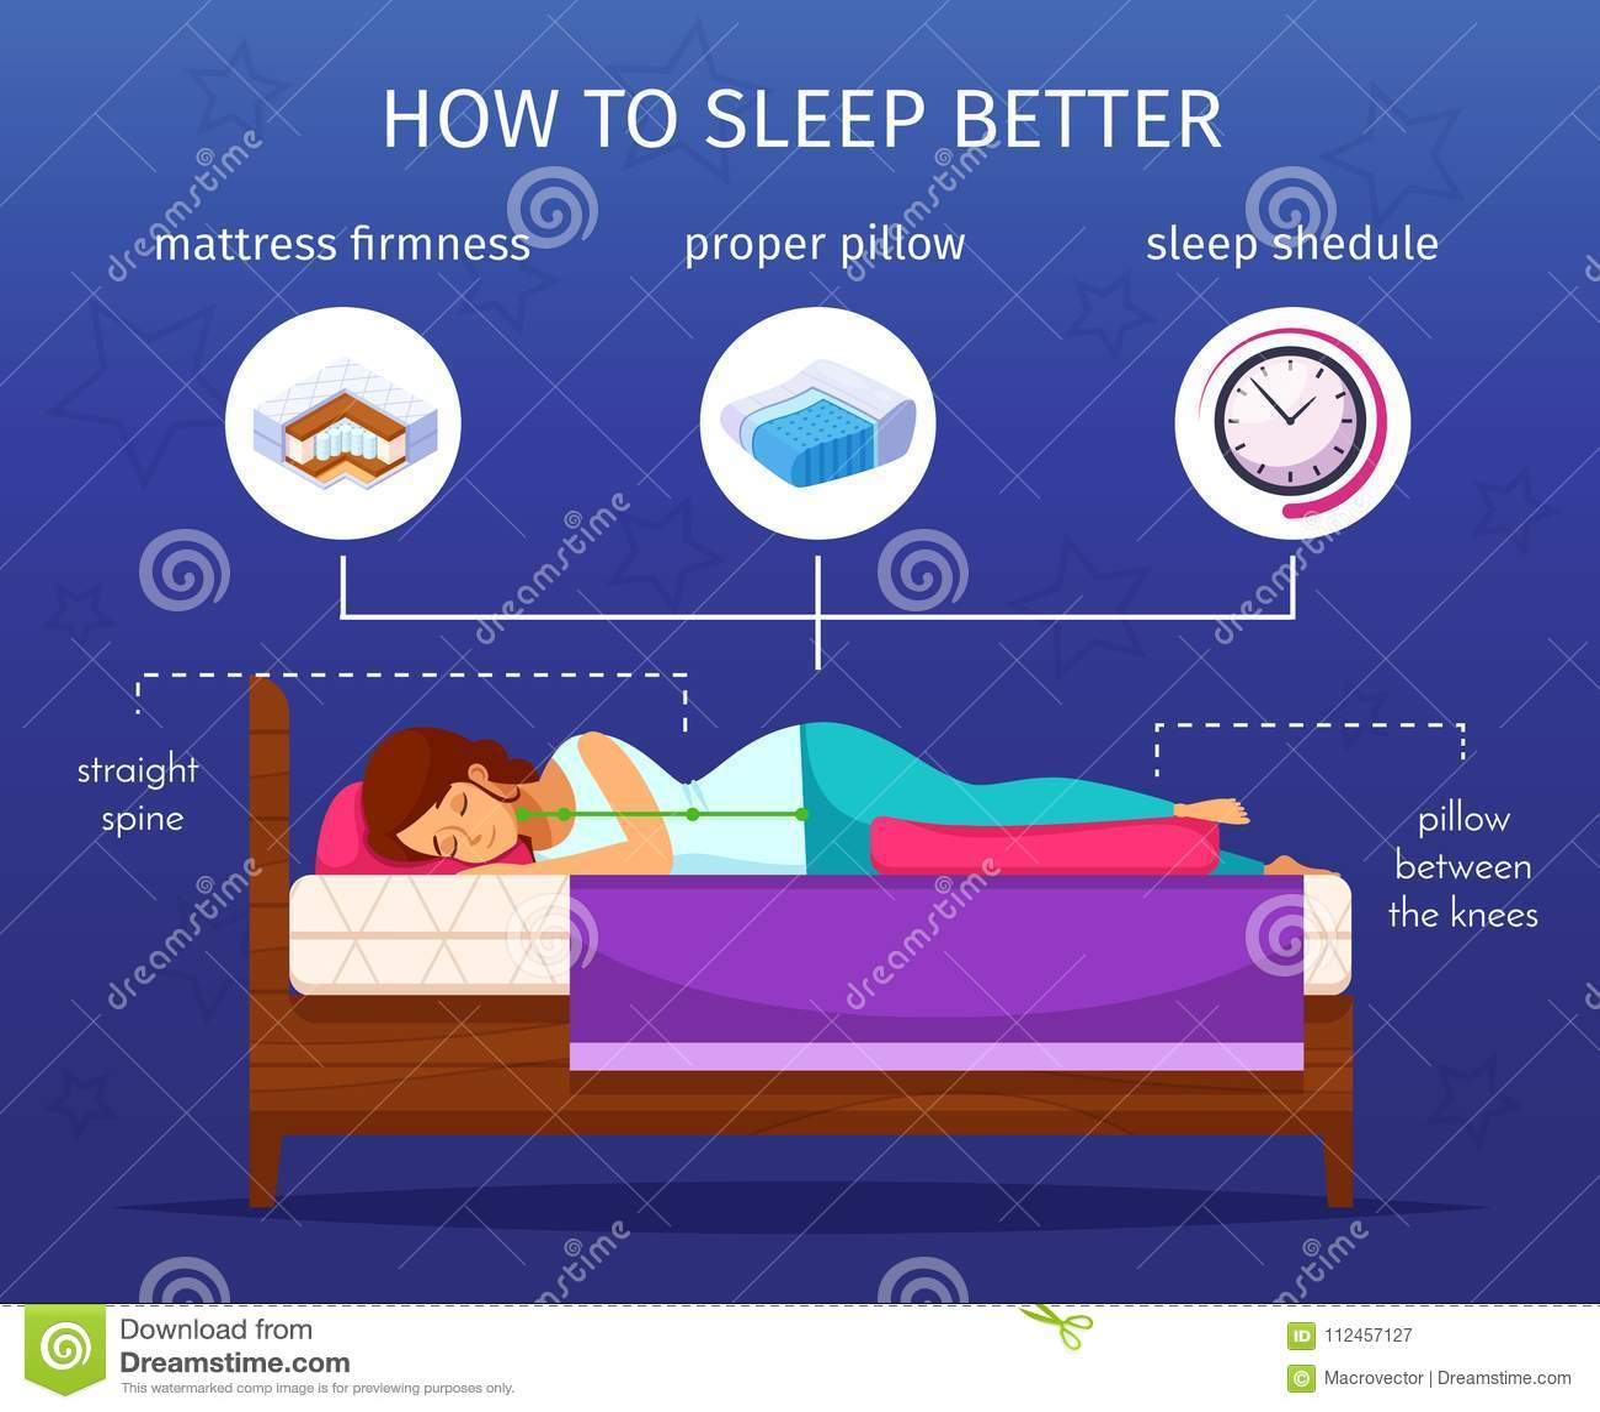 Z-Sleep